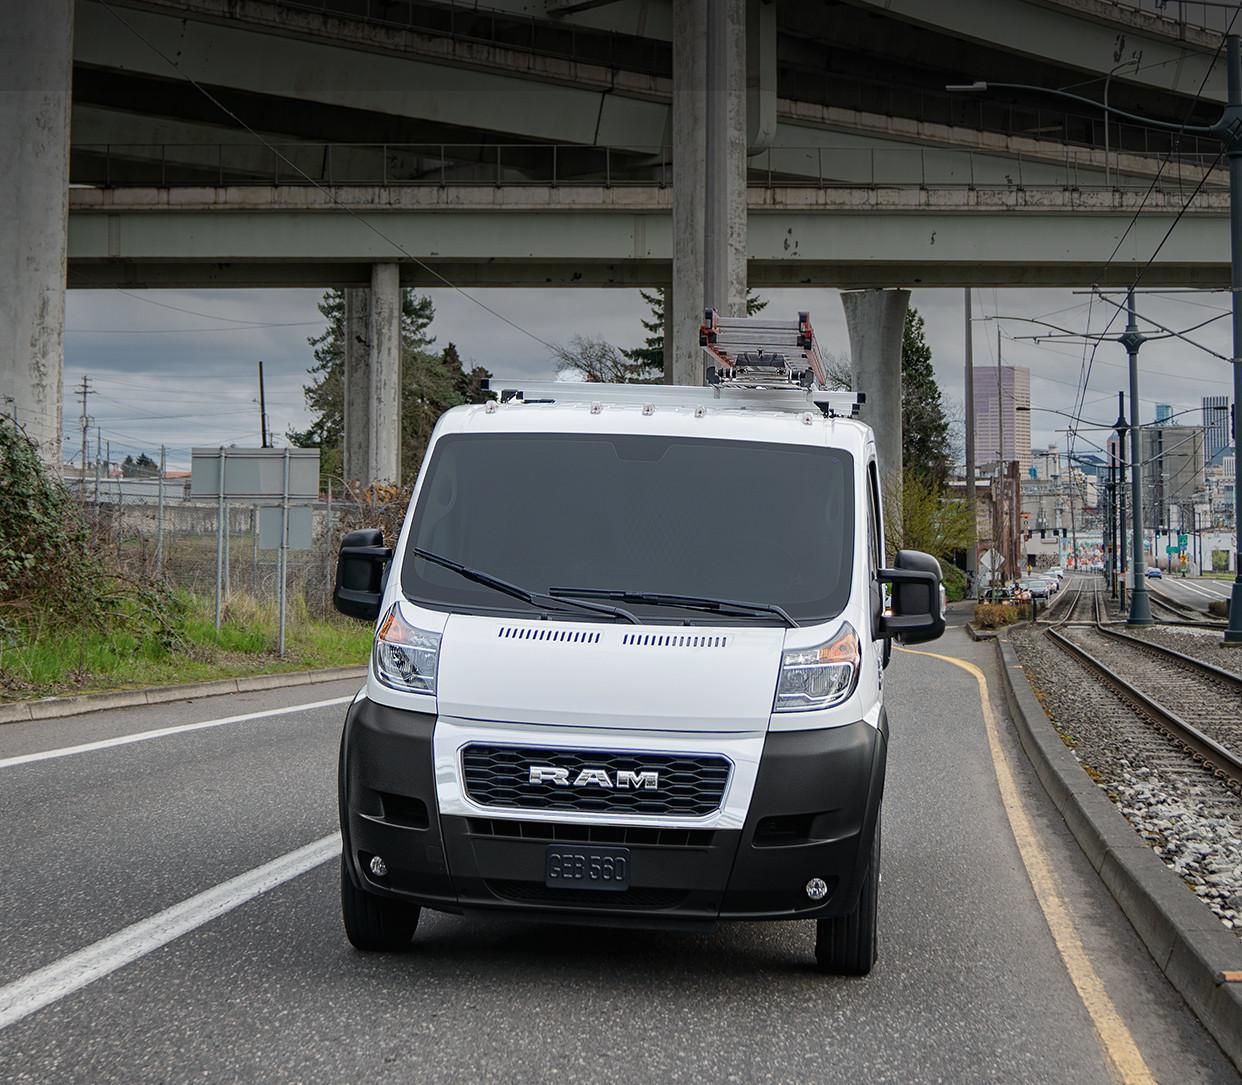 2019 Ram Promaster Cargo Van Trucks Canada High Amp Alternator Wiring Diagram Front View Driving Down Highway Shown In White